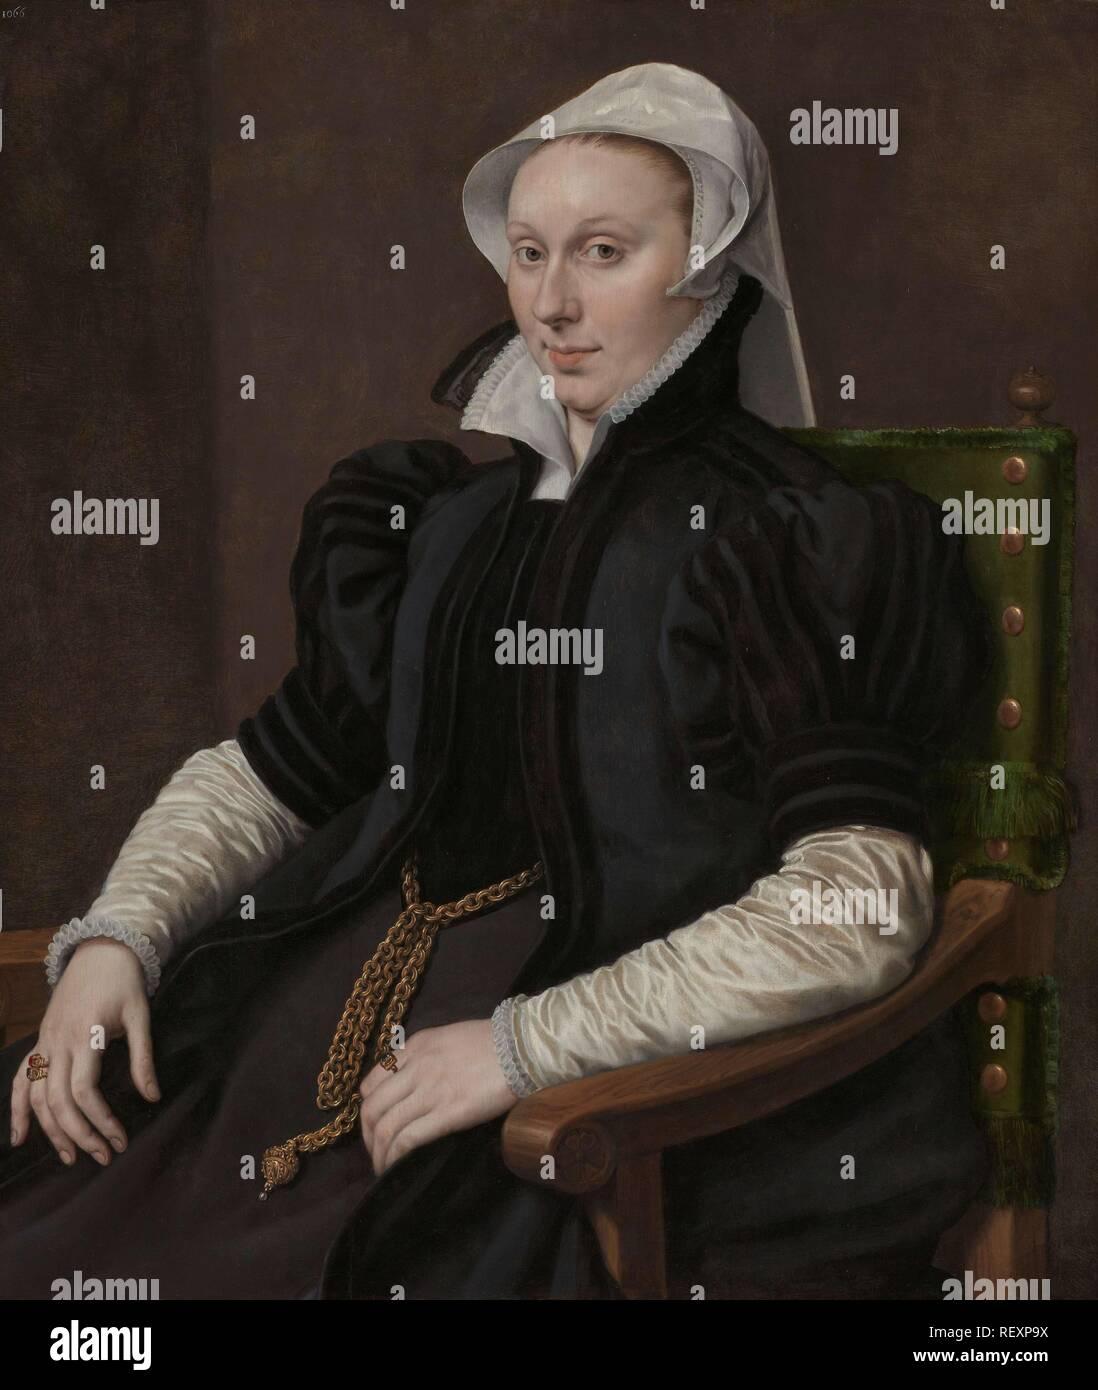 Portraits of Sir Thomas Gresham and Anne Fernely. Portrait of Anne Fernely. Wife of Sir Thomas Gresham. Dating: c. 1560 - c. 1565. Place: Antwerp. Measurements: h 88 cm × w 75.5 cm. Museum: Rijksmuseum, Amsterdam. Author: Anthonis Mor. - Stock Image